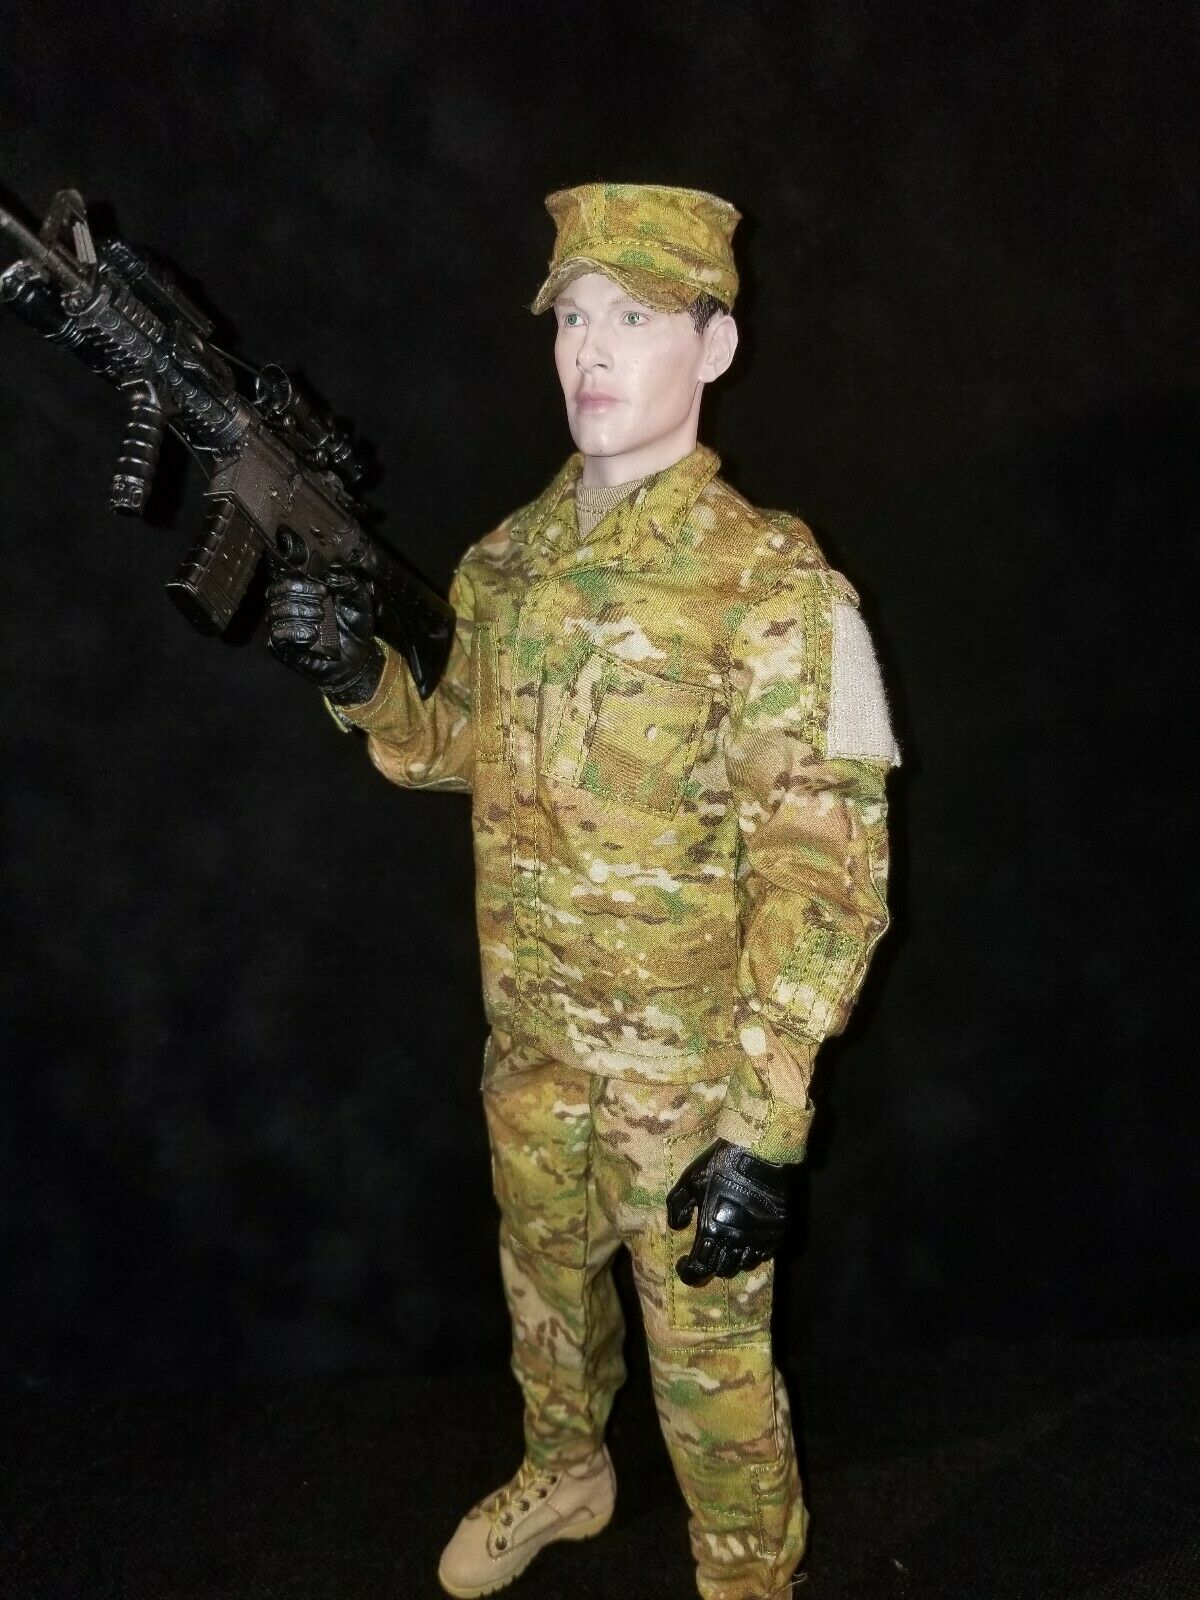 1 6 BANDIT JOES EXCLUSIVE US ARMY SCORPION OCP UPDATED UNIFORM SET.